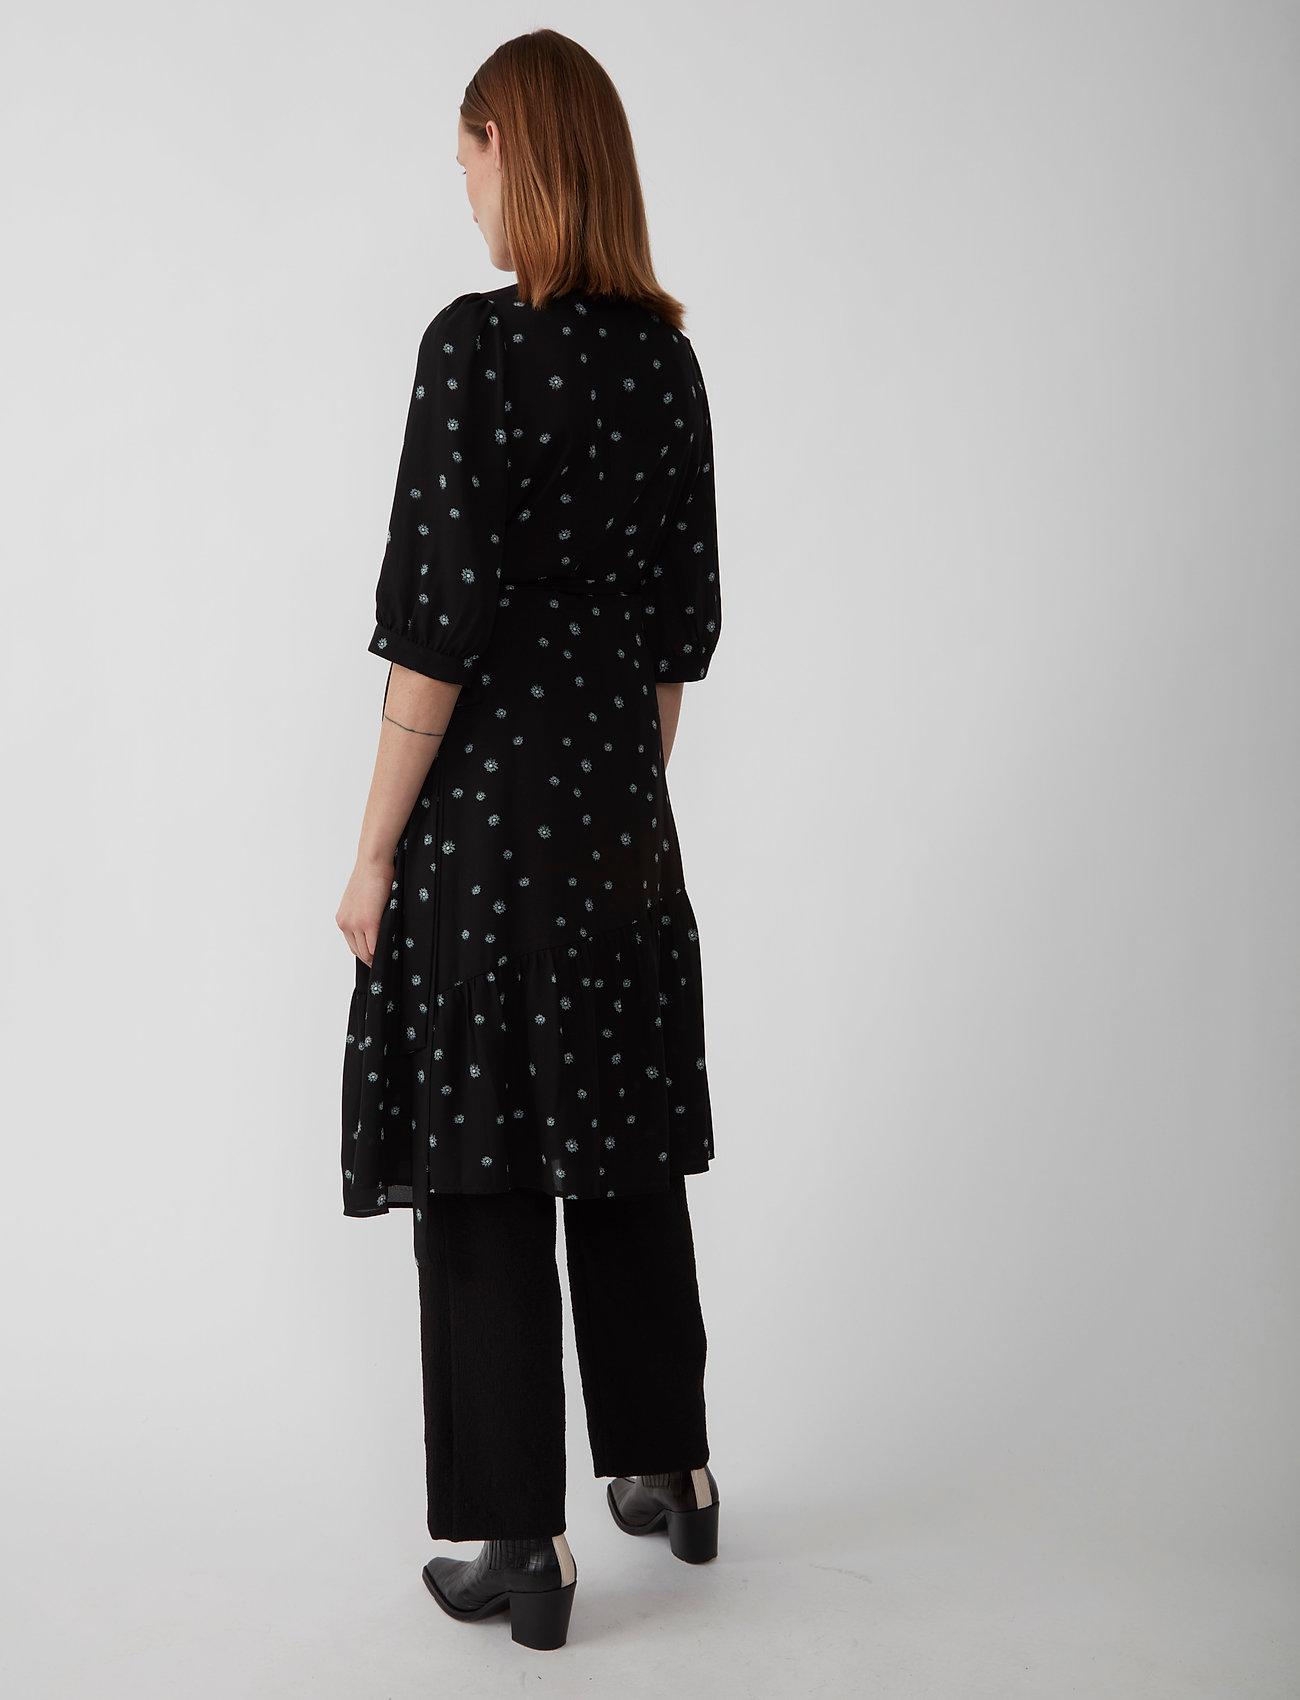 Jessie Wrap Dress   - Just Female -  Women's Dresses New